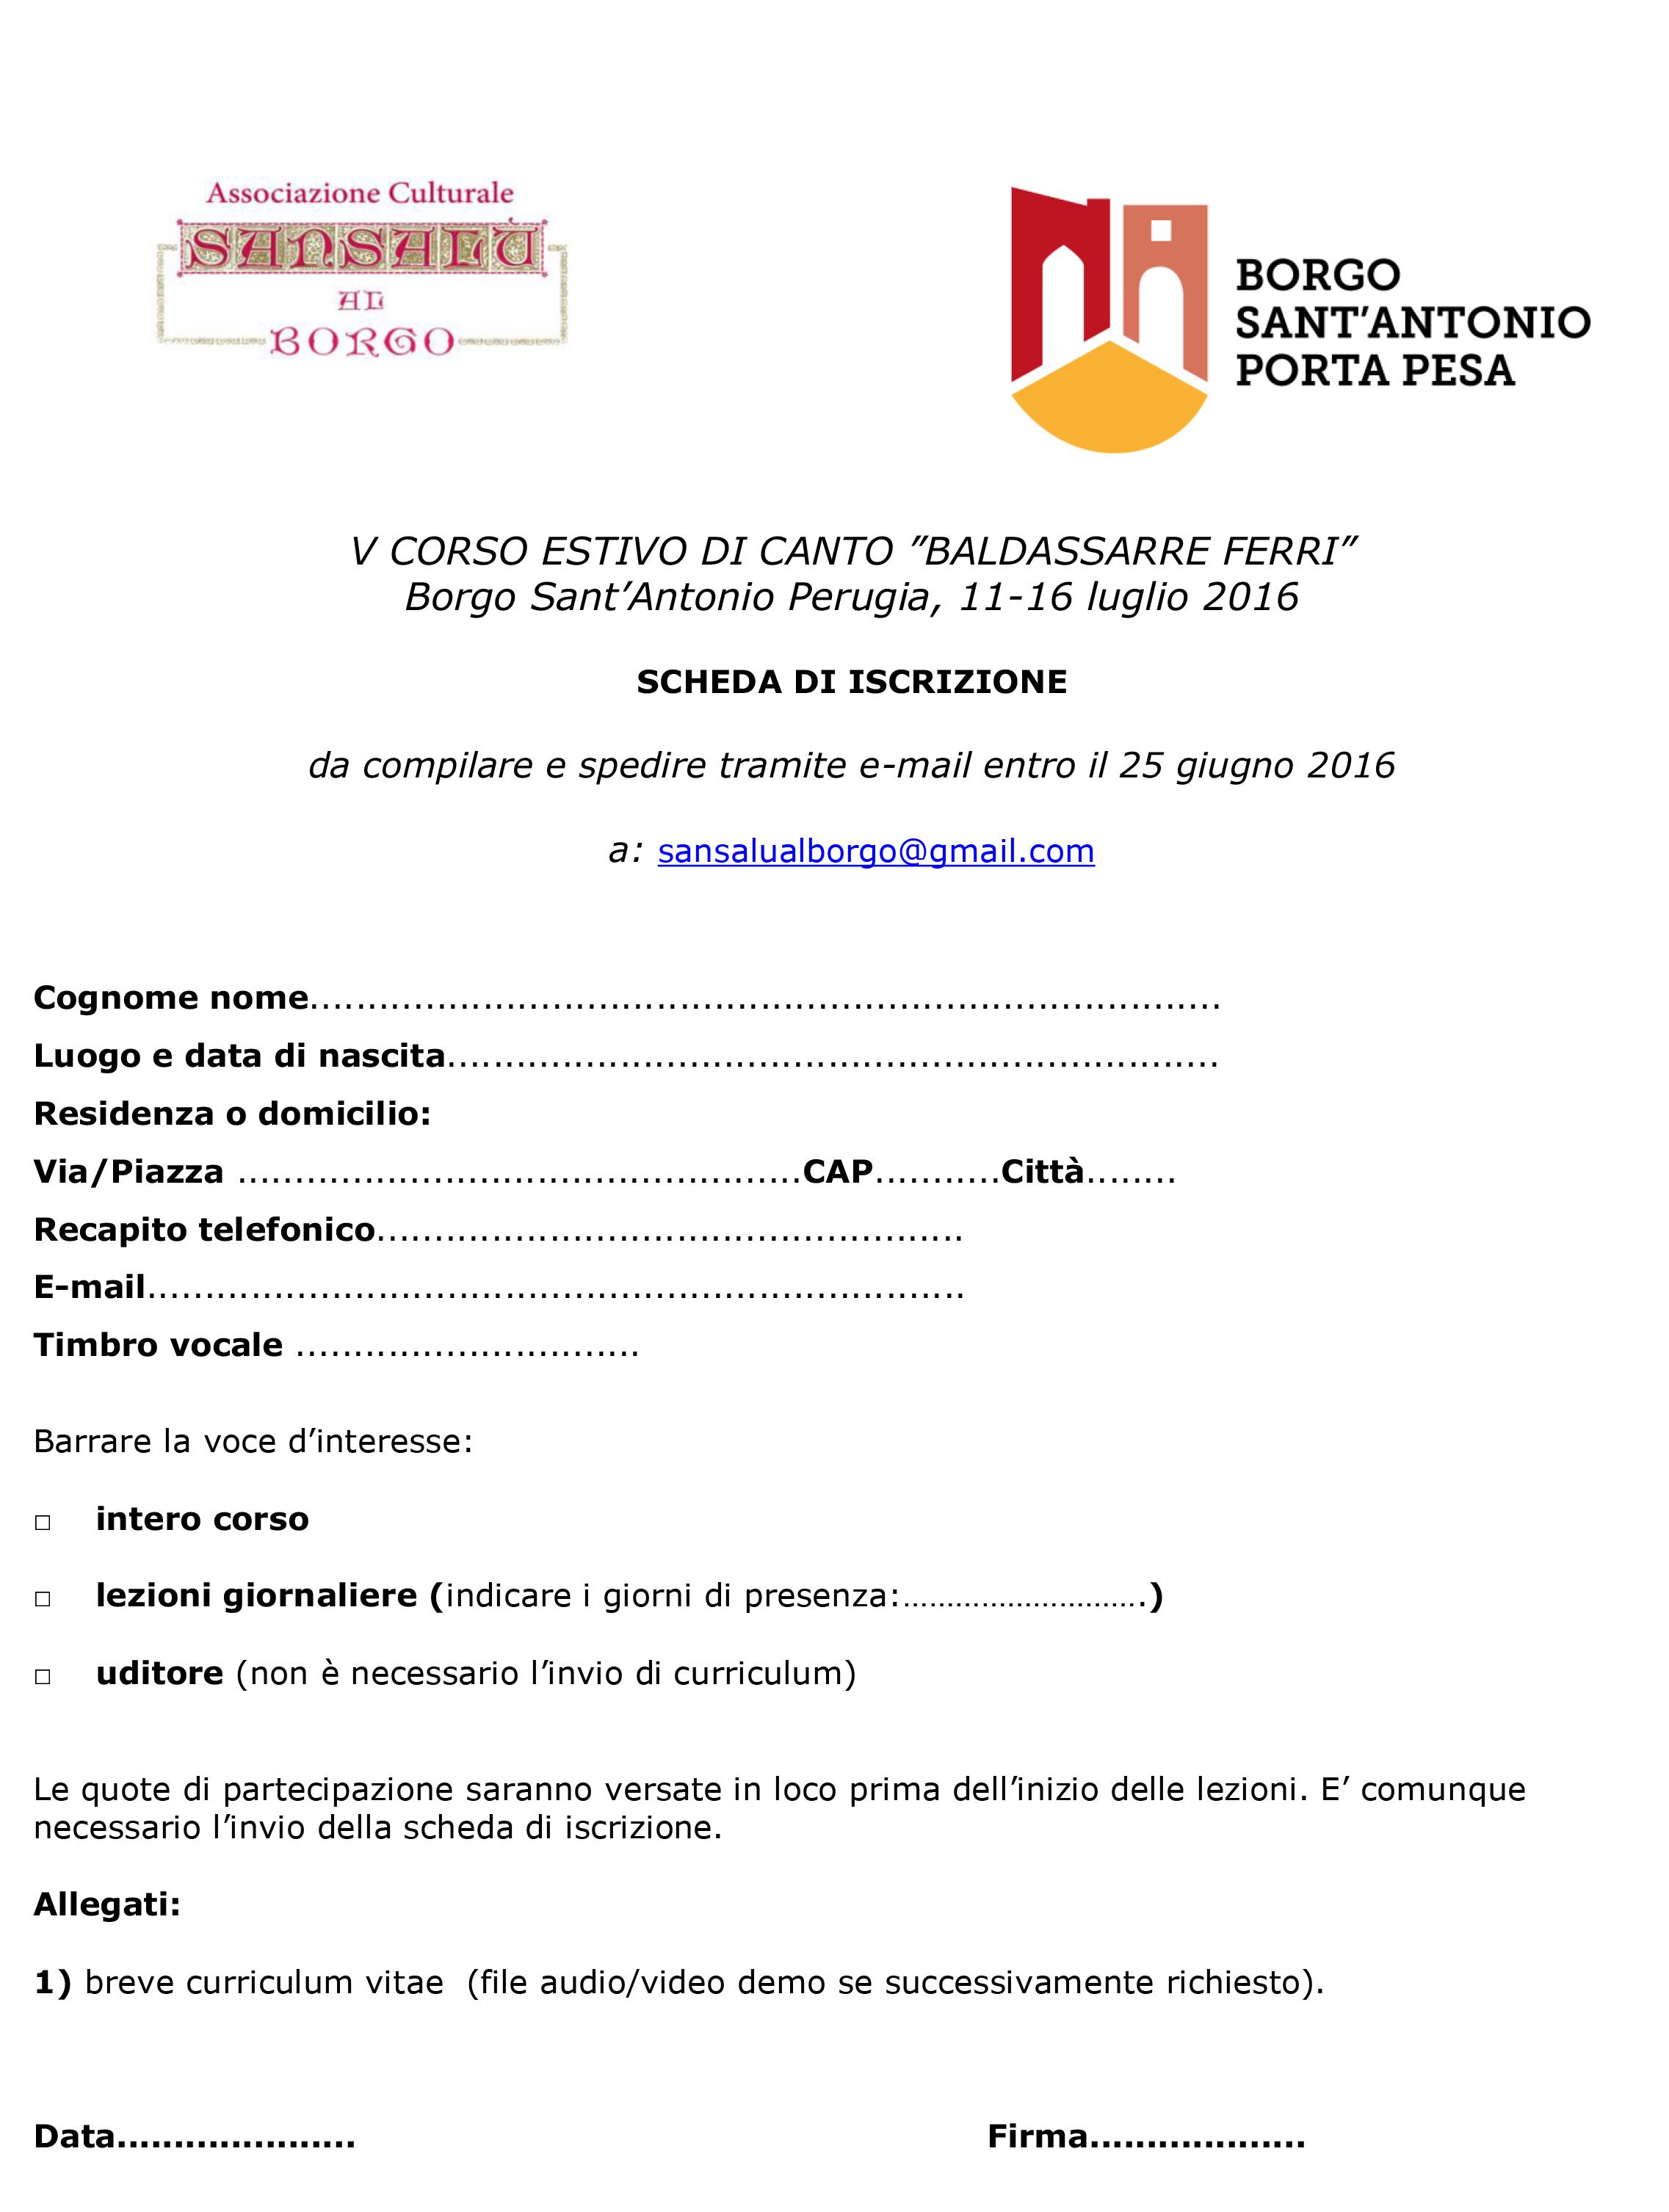 Perugia 2016 sito Borgo-4